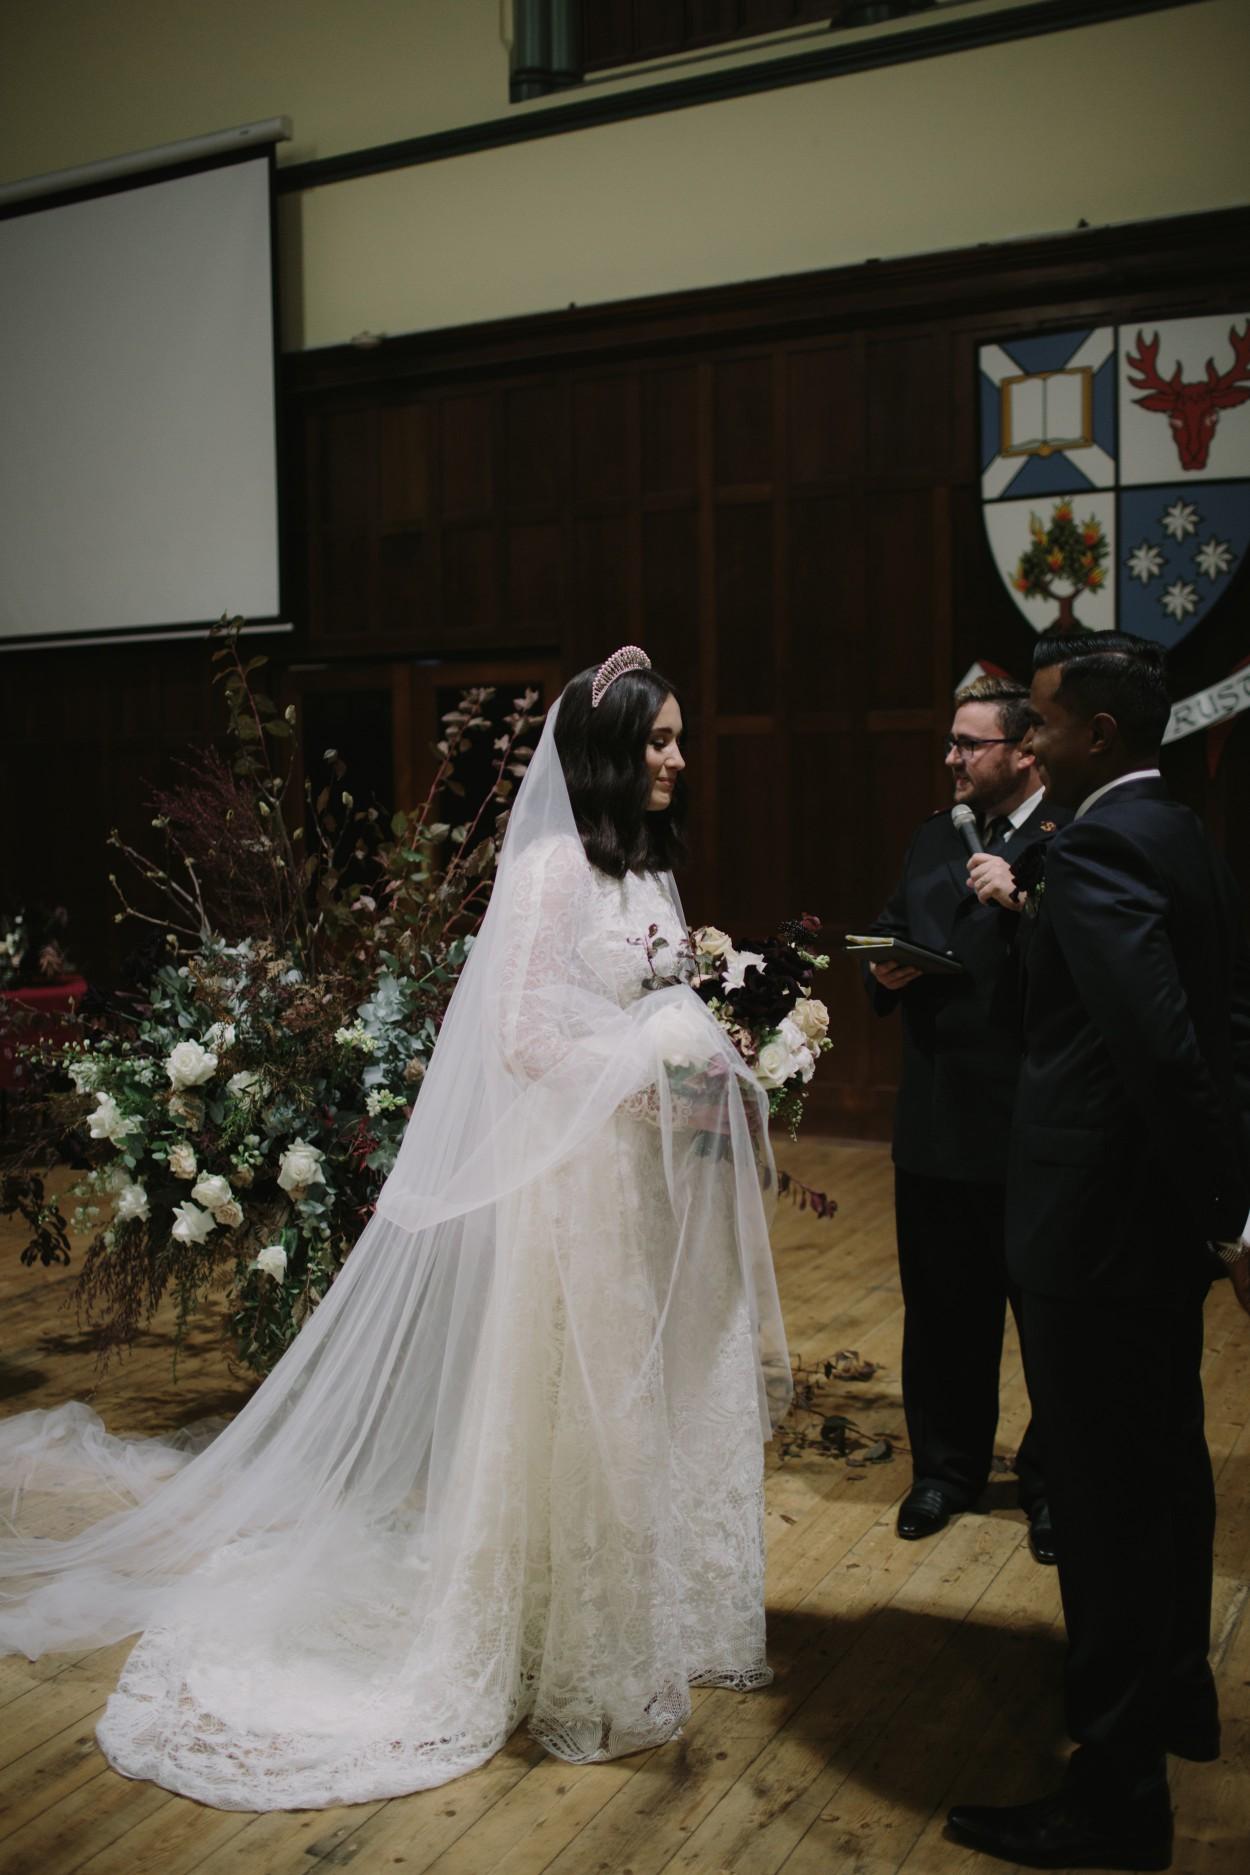 I-Got-You-Babe-Weddings-The-026George-Ballroom-St-Kilda-Wedding-Amy-Abhi.jpg